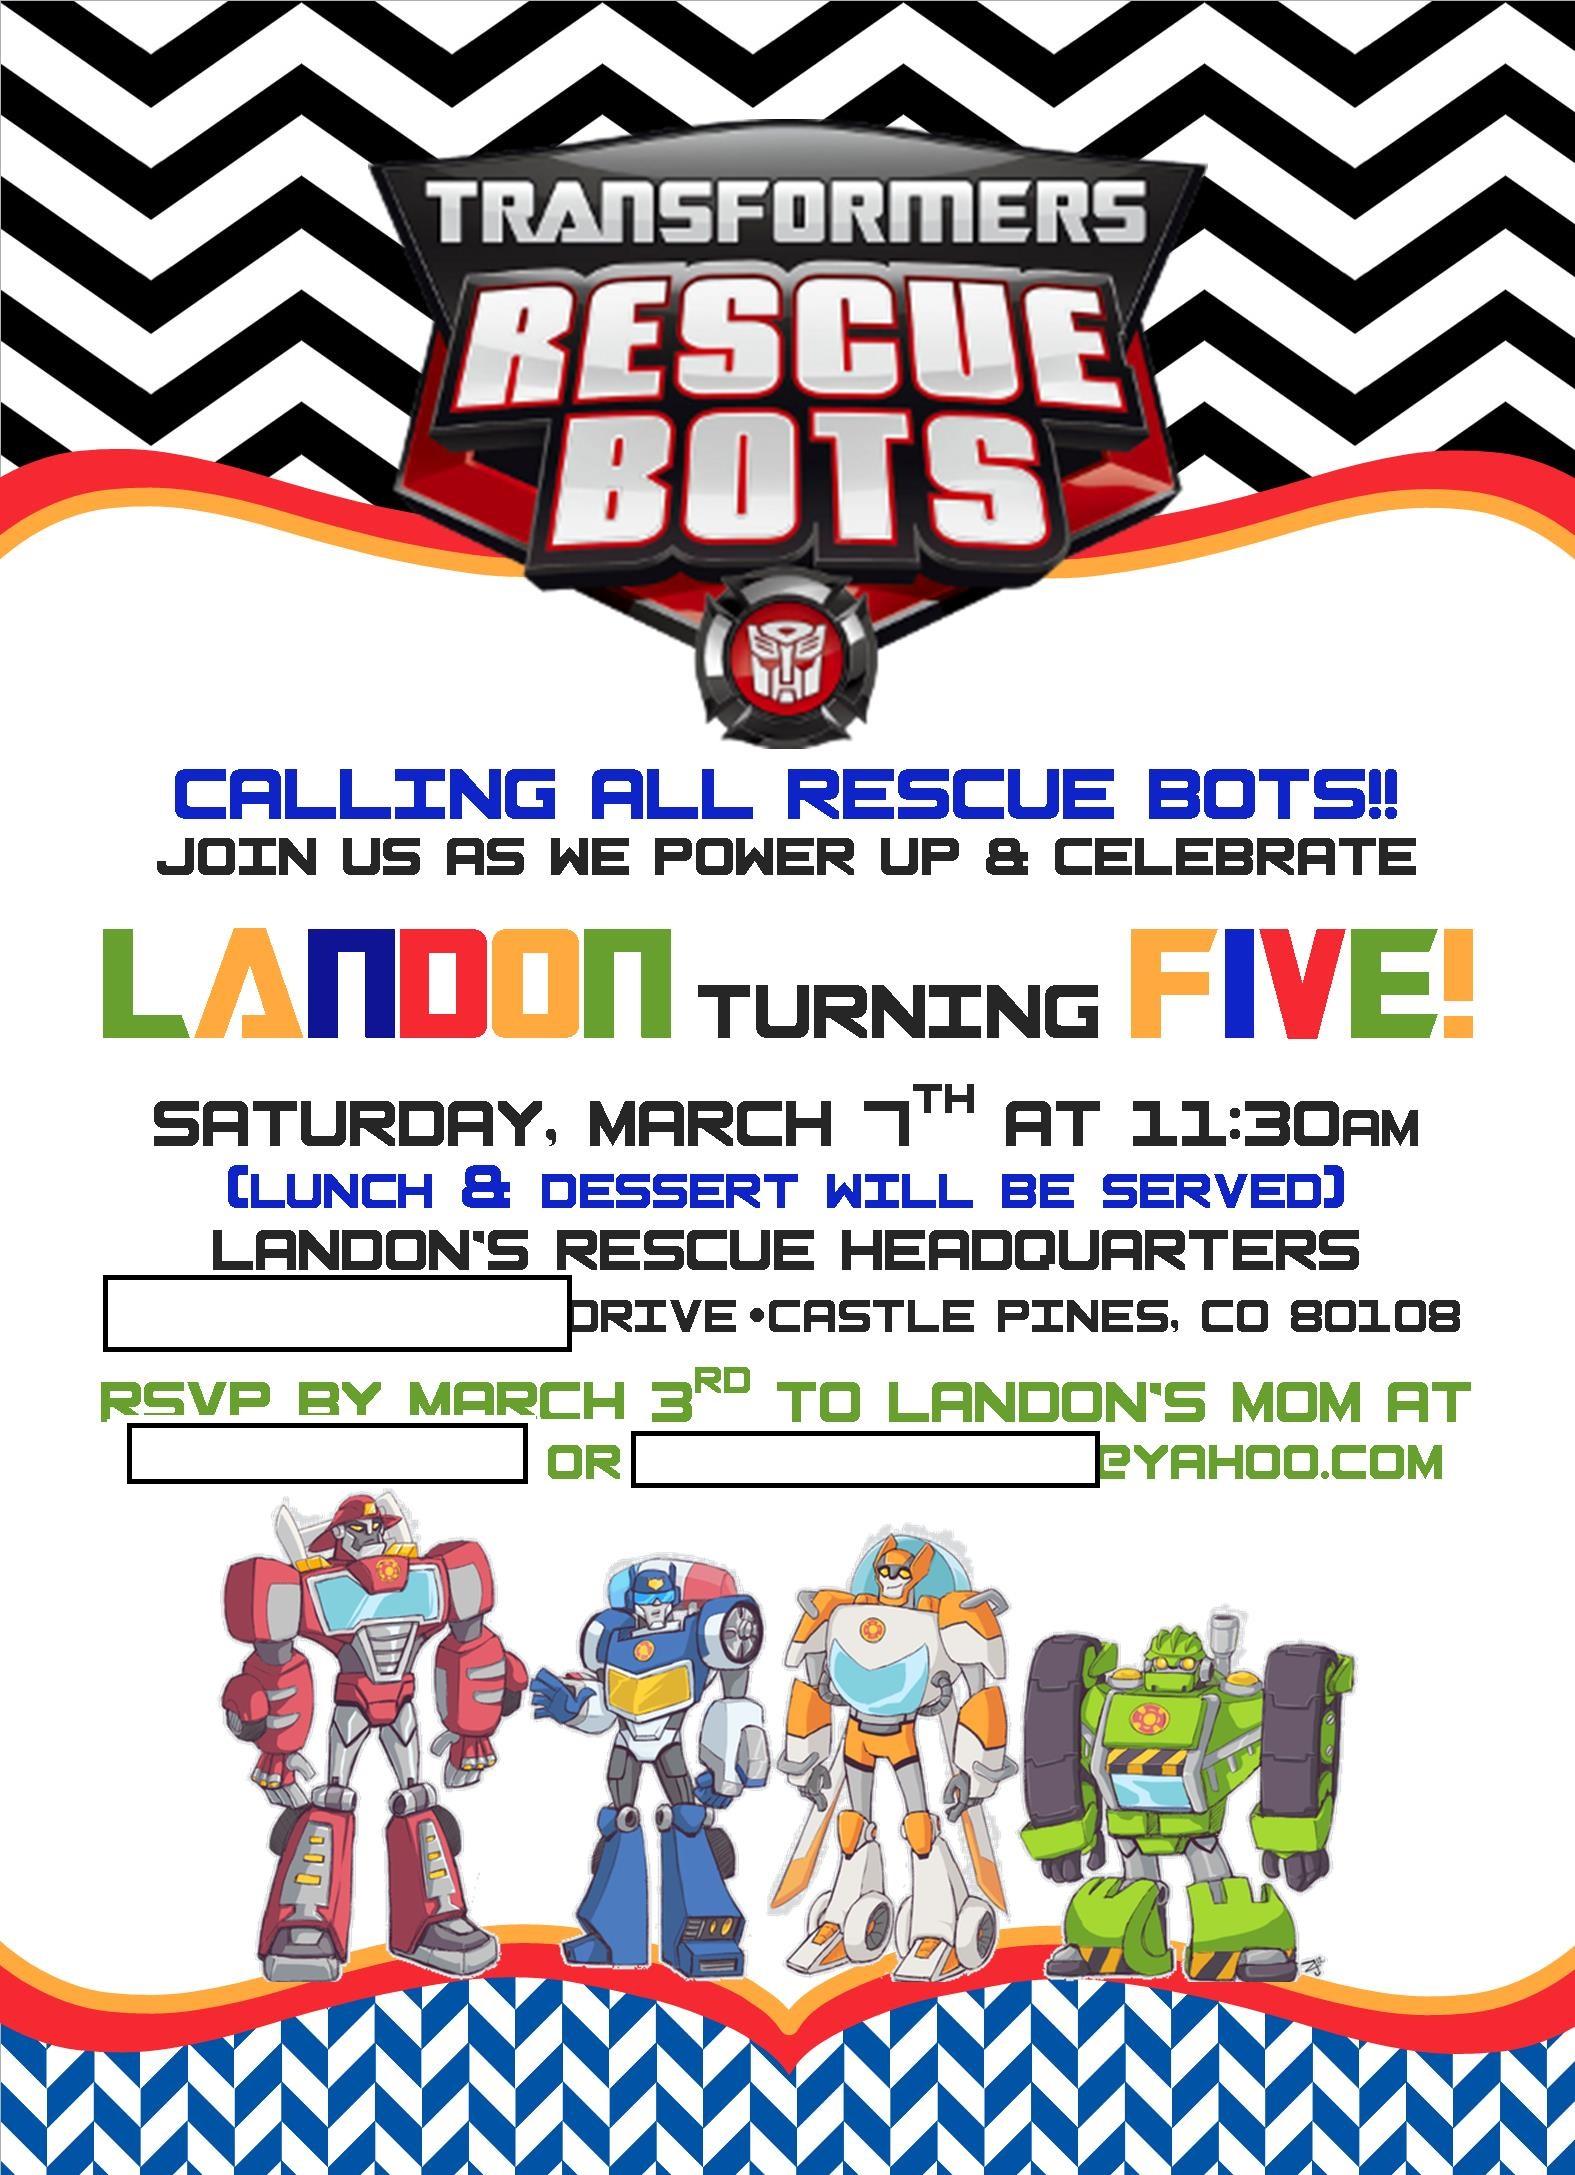 Landon's Rescue Bots 5th Birthday - Project Nursery